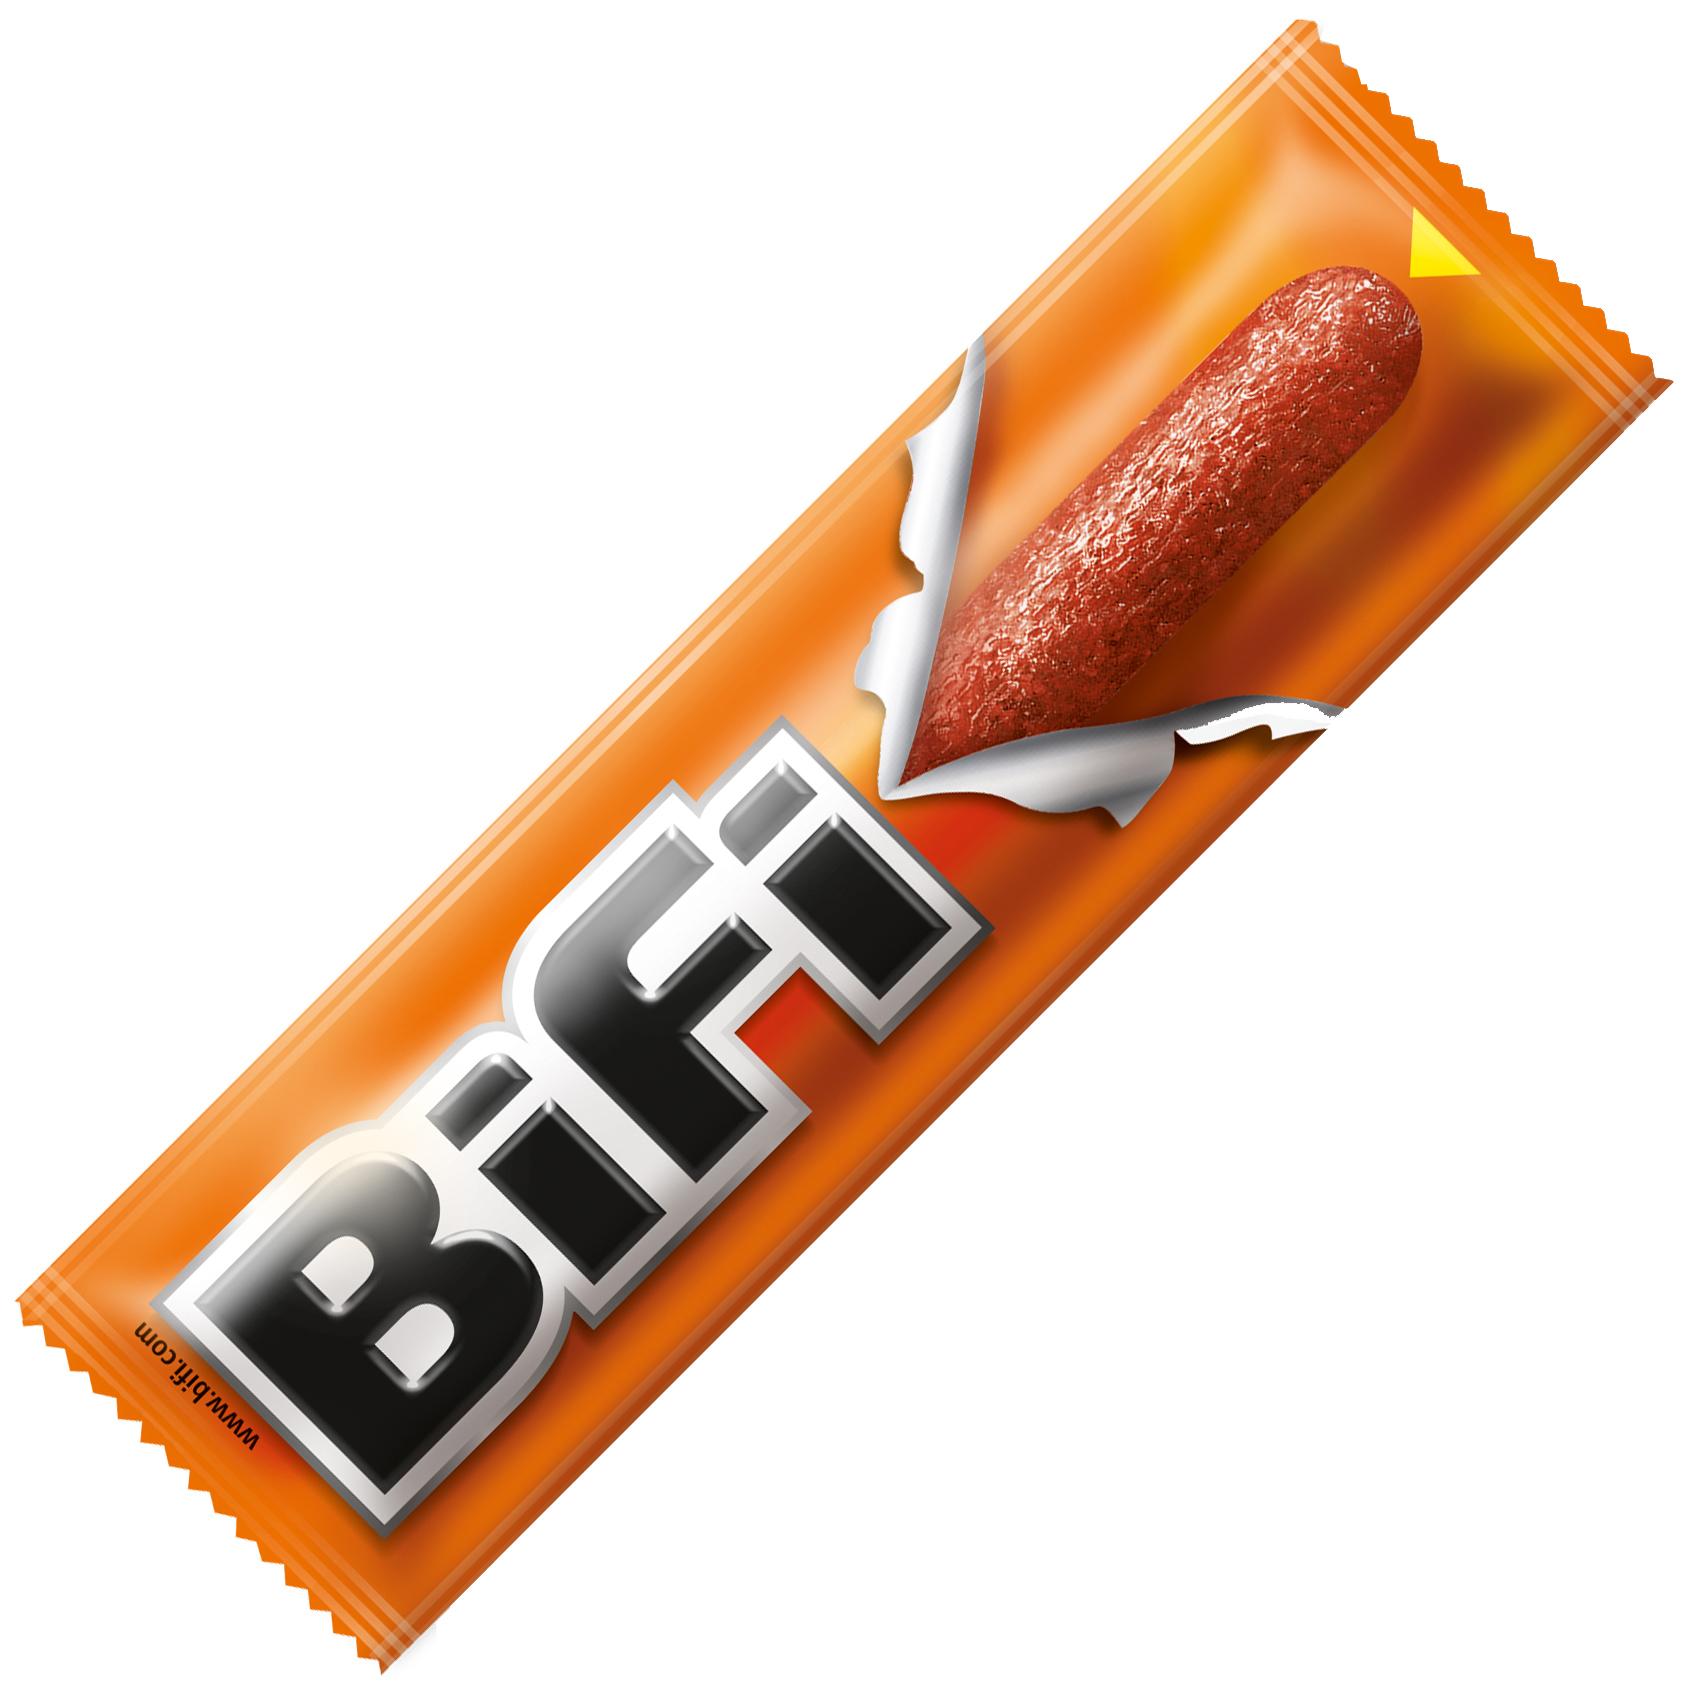 bifi original 25g online kaufen im world of sweets shop. Black Bedroom Furniture Sets. Home Design Ideas